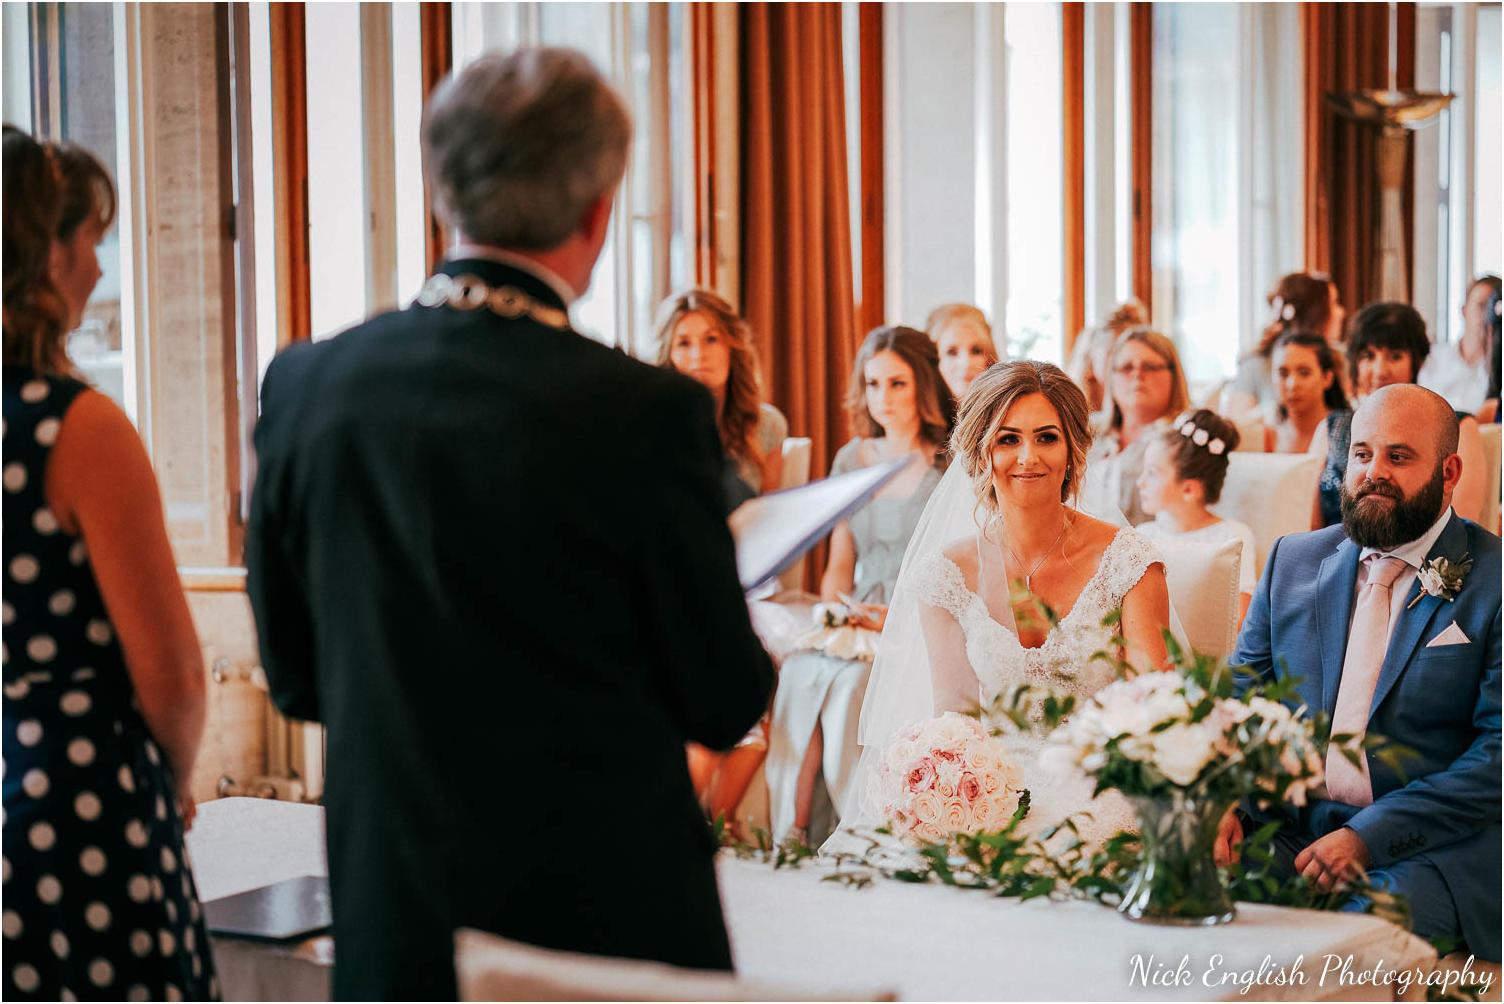 Destination_Wedding_Photographer_Slovenia_Nick_English_Photography-42.jpg